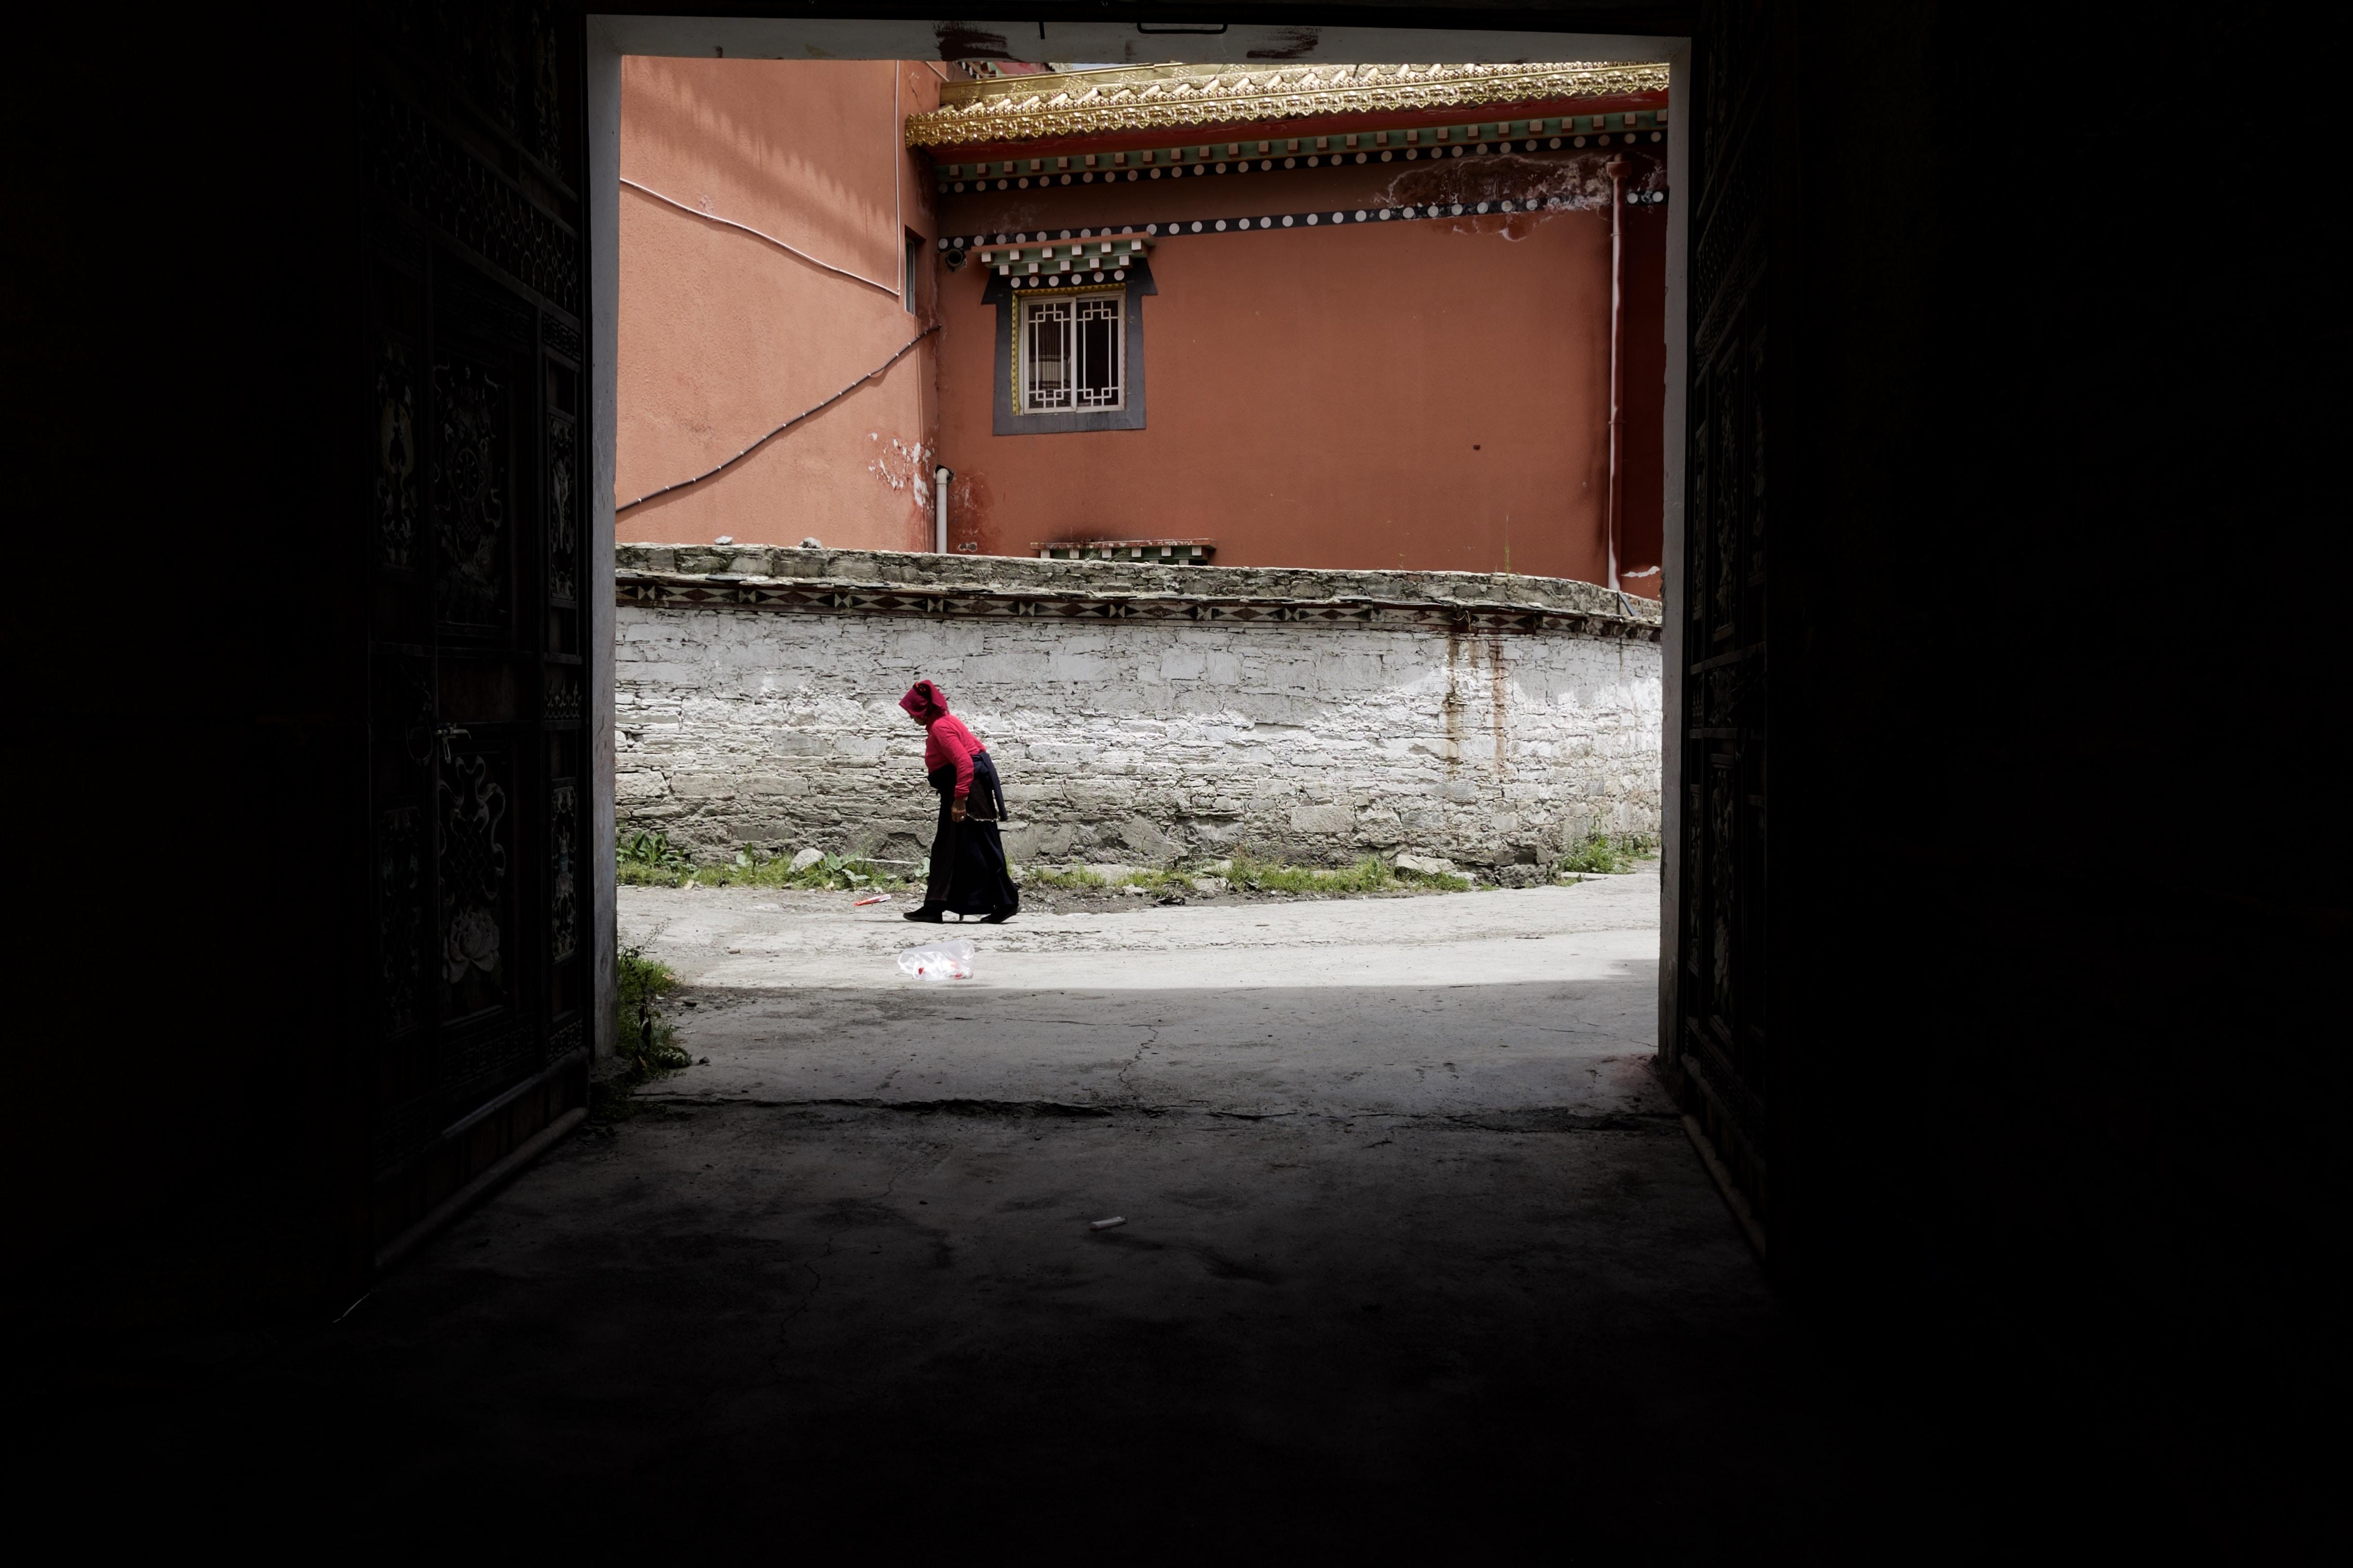 person walking near orange building